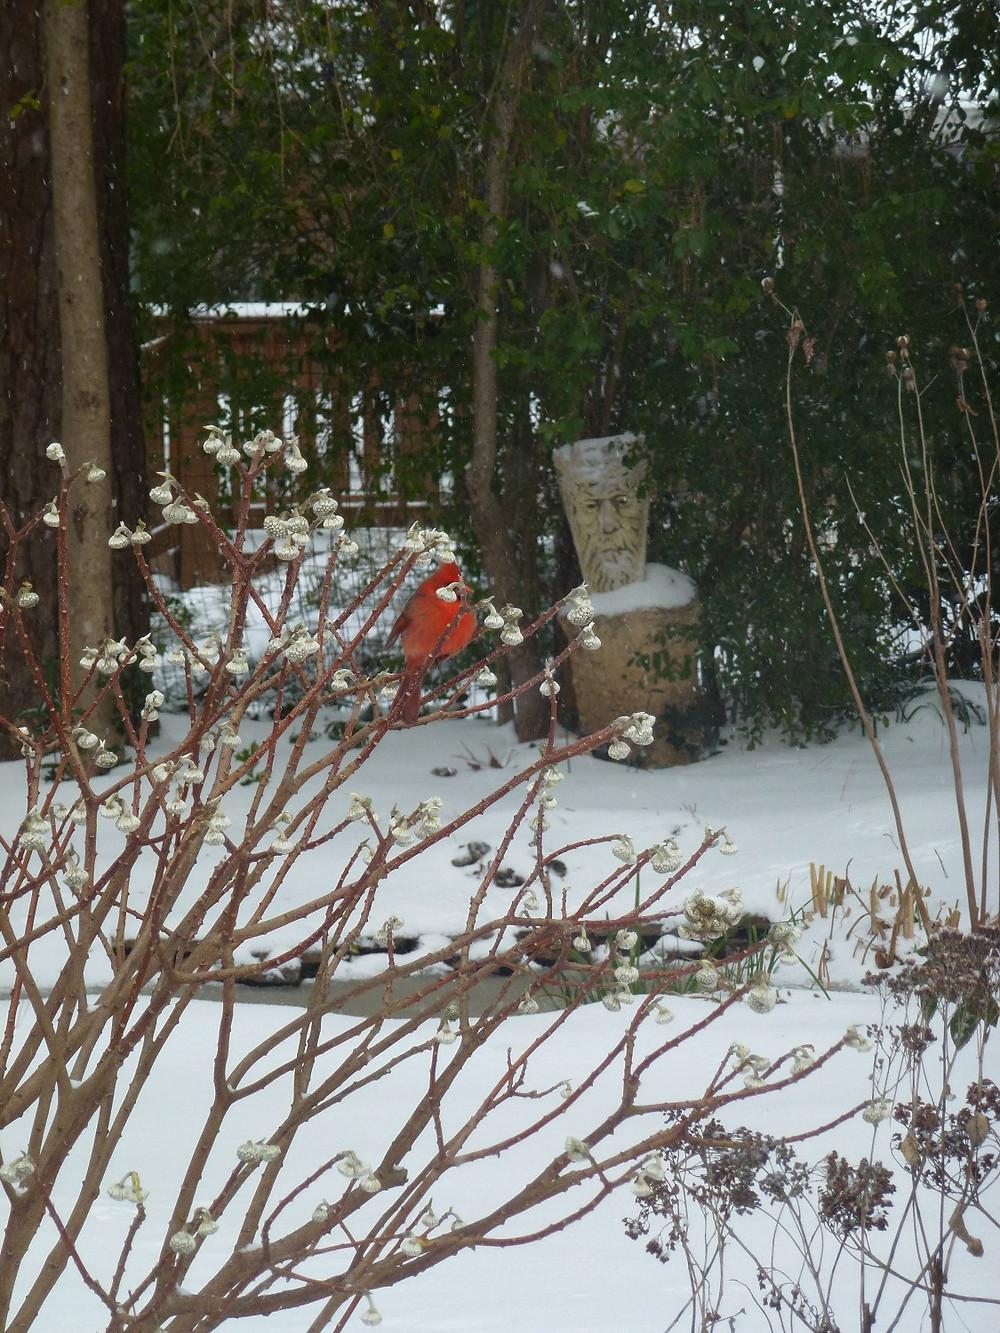 Paper Bush edgeworthia in snow with cardinal